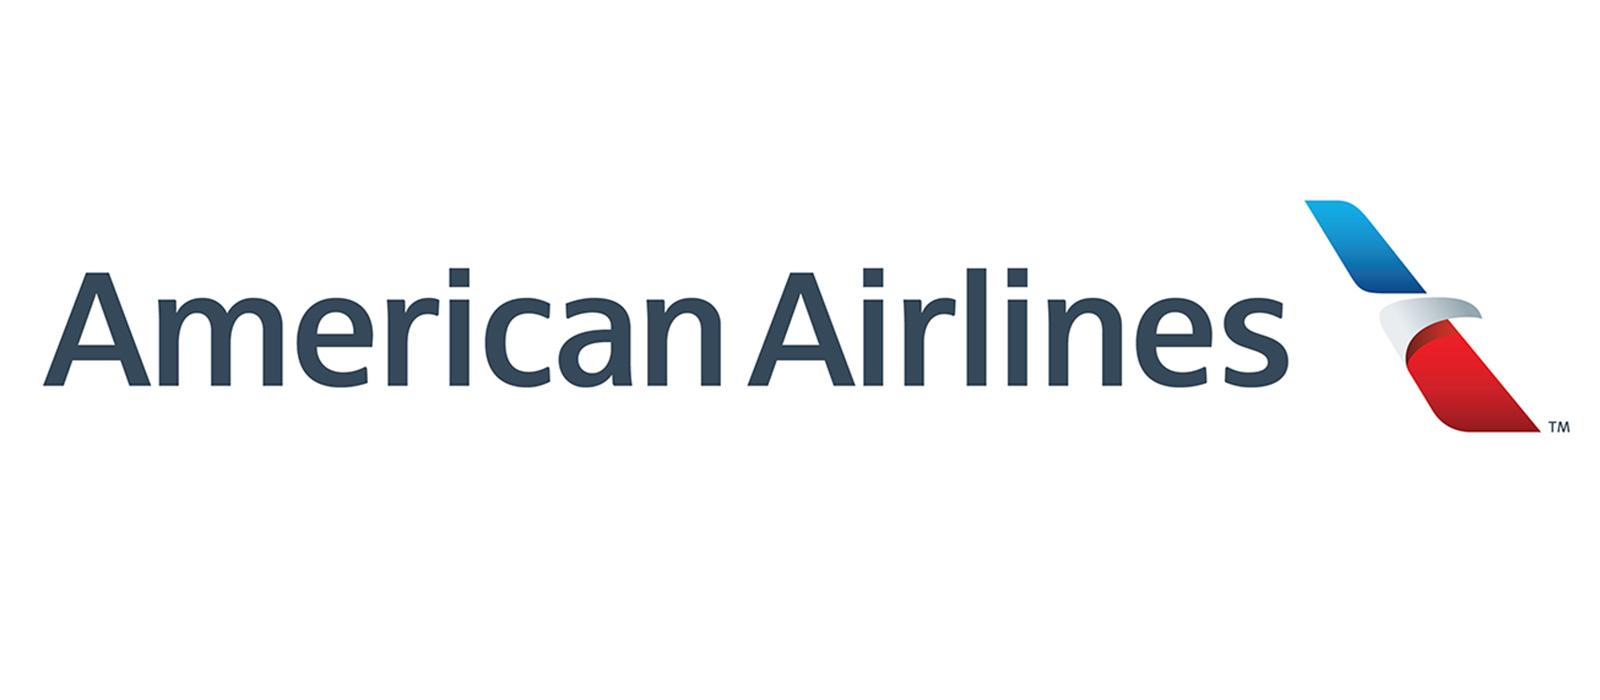 American Airlines Debuts New Modern Look Corporate